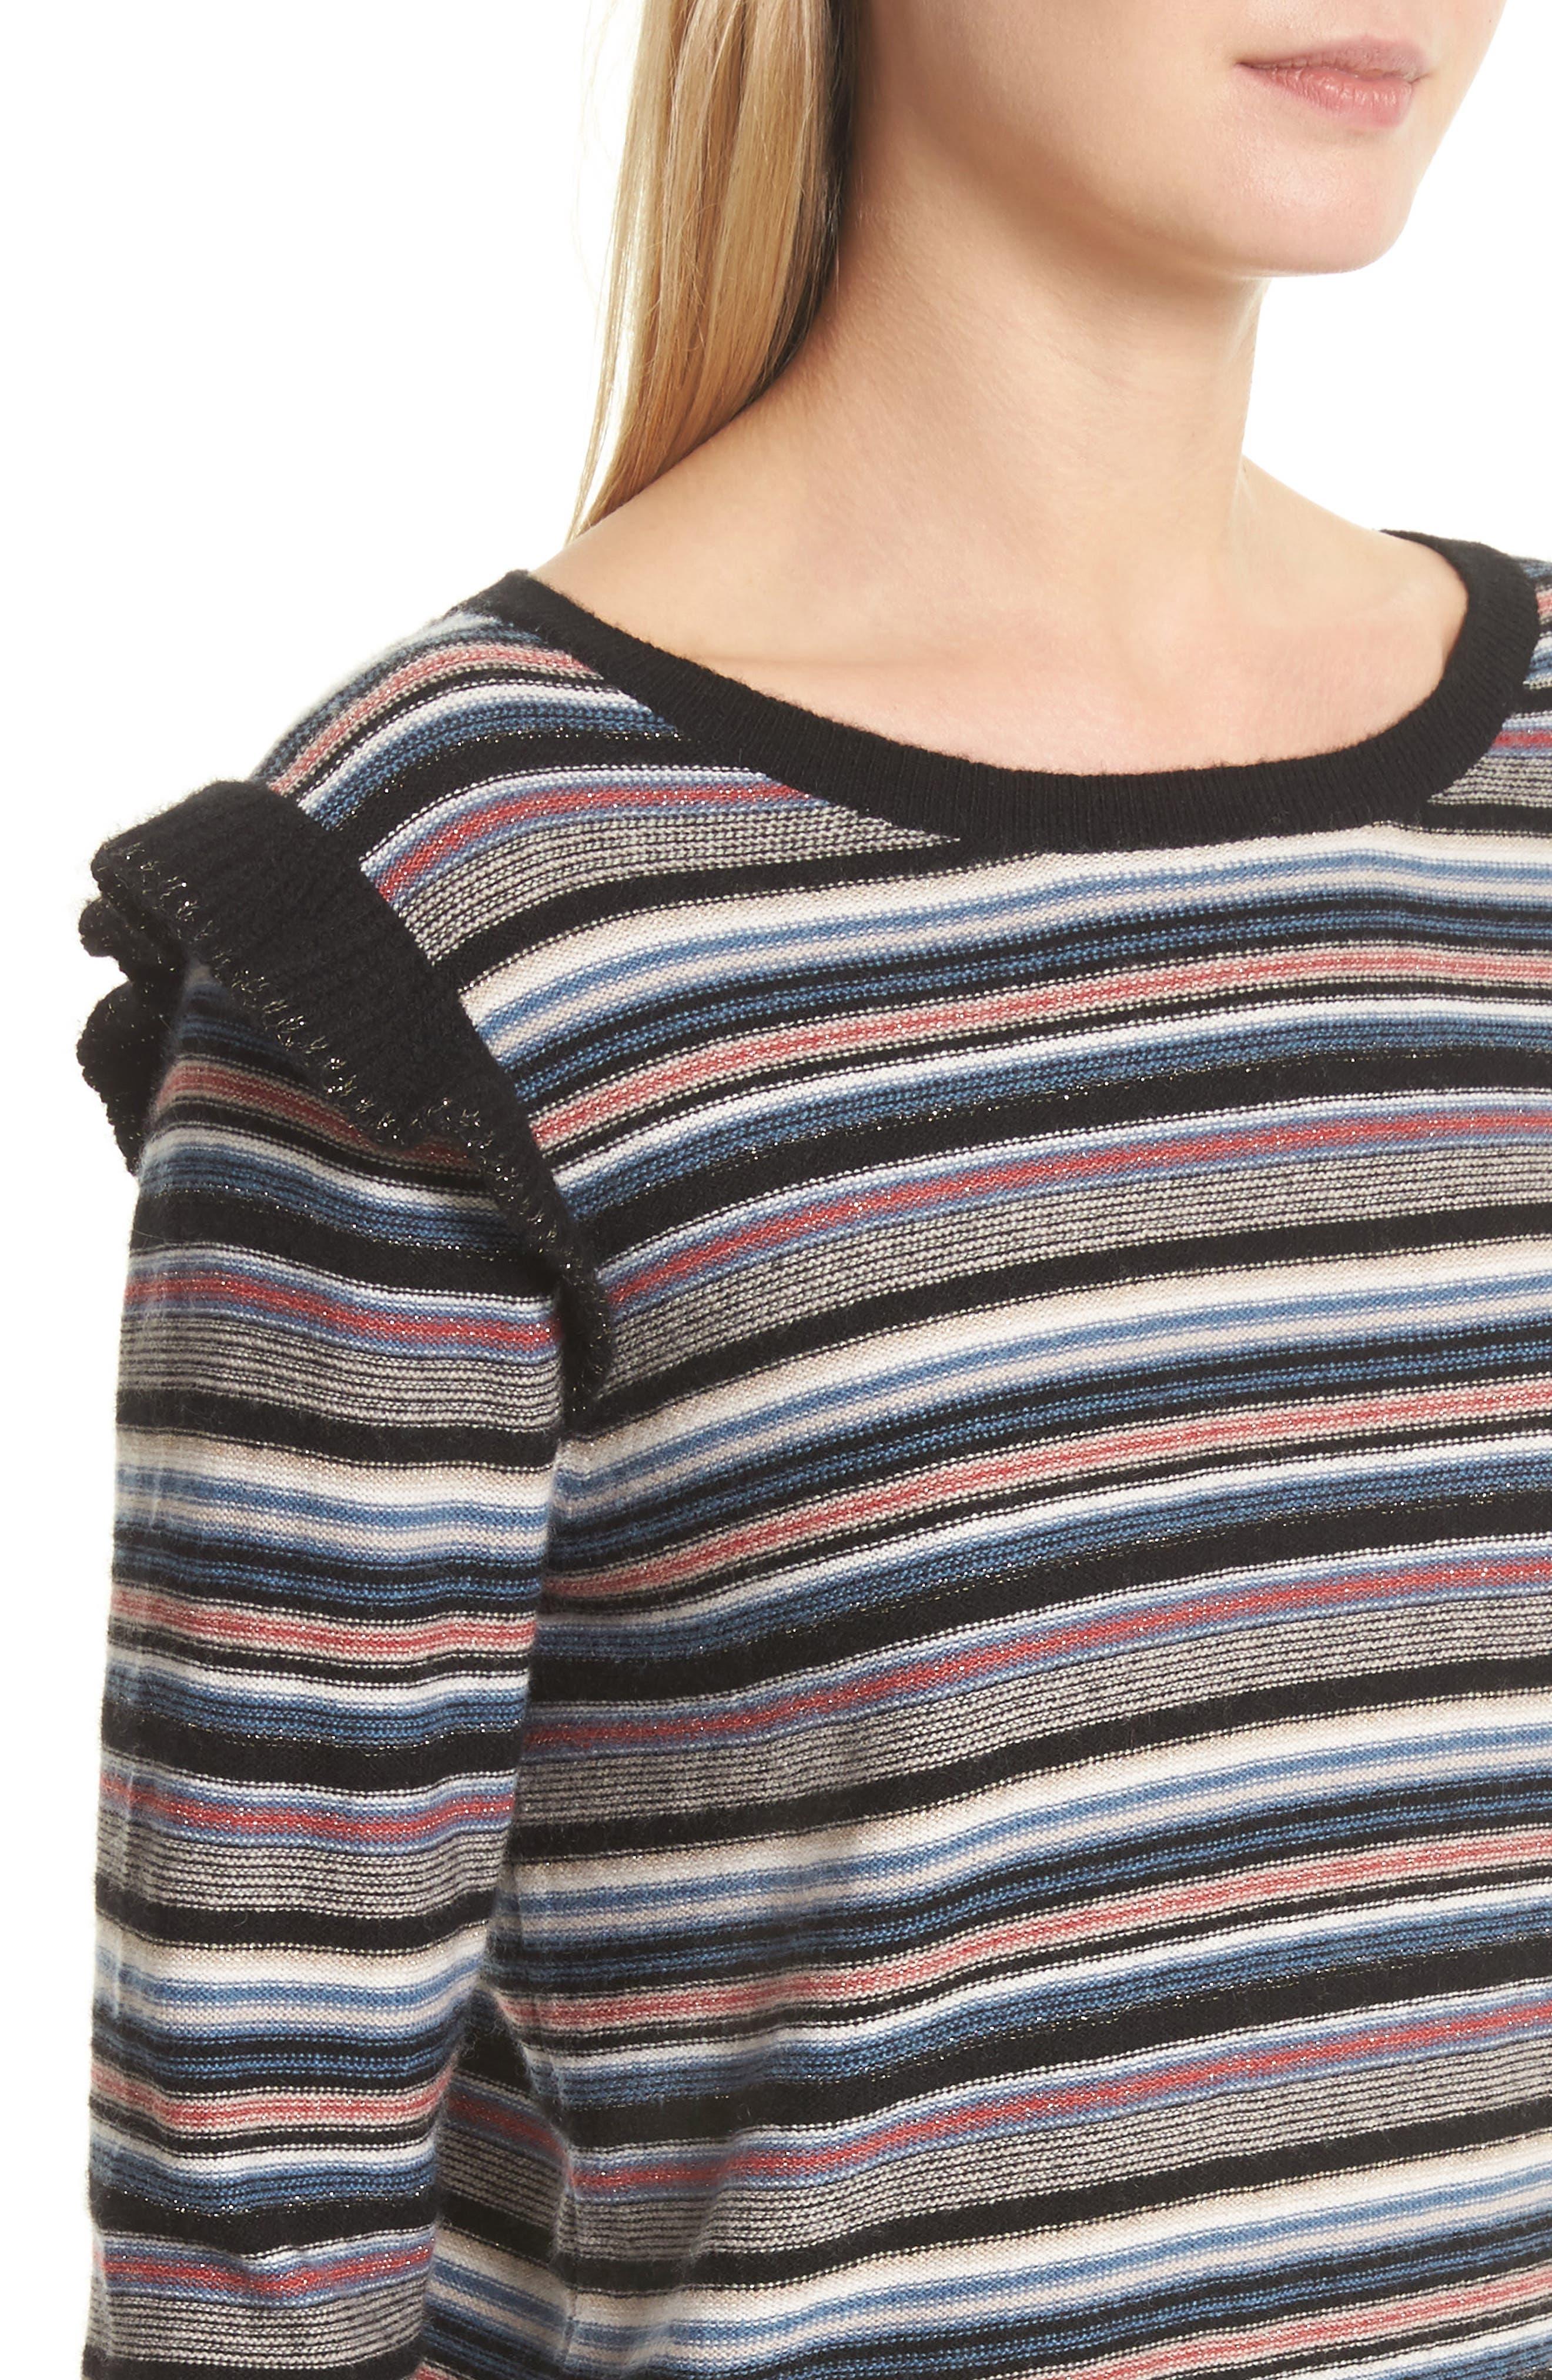 Cais C Stripe Wool & Cashmere Sweater,                             Alternate thumbnail 4, color,                             001